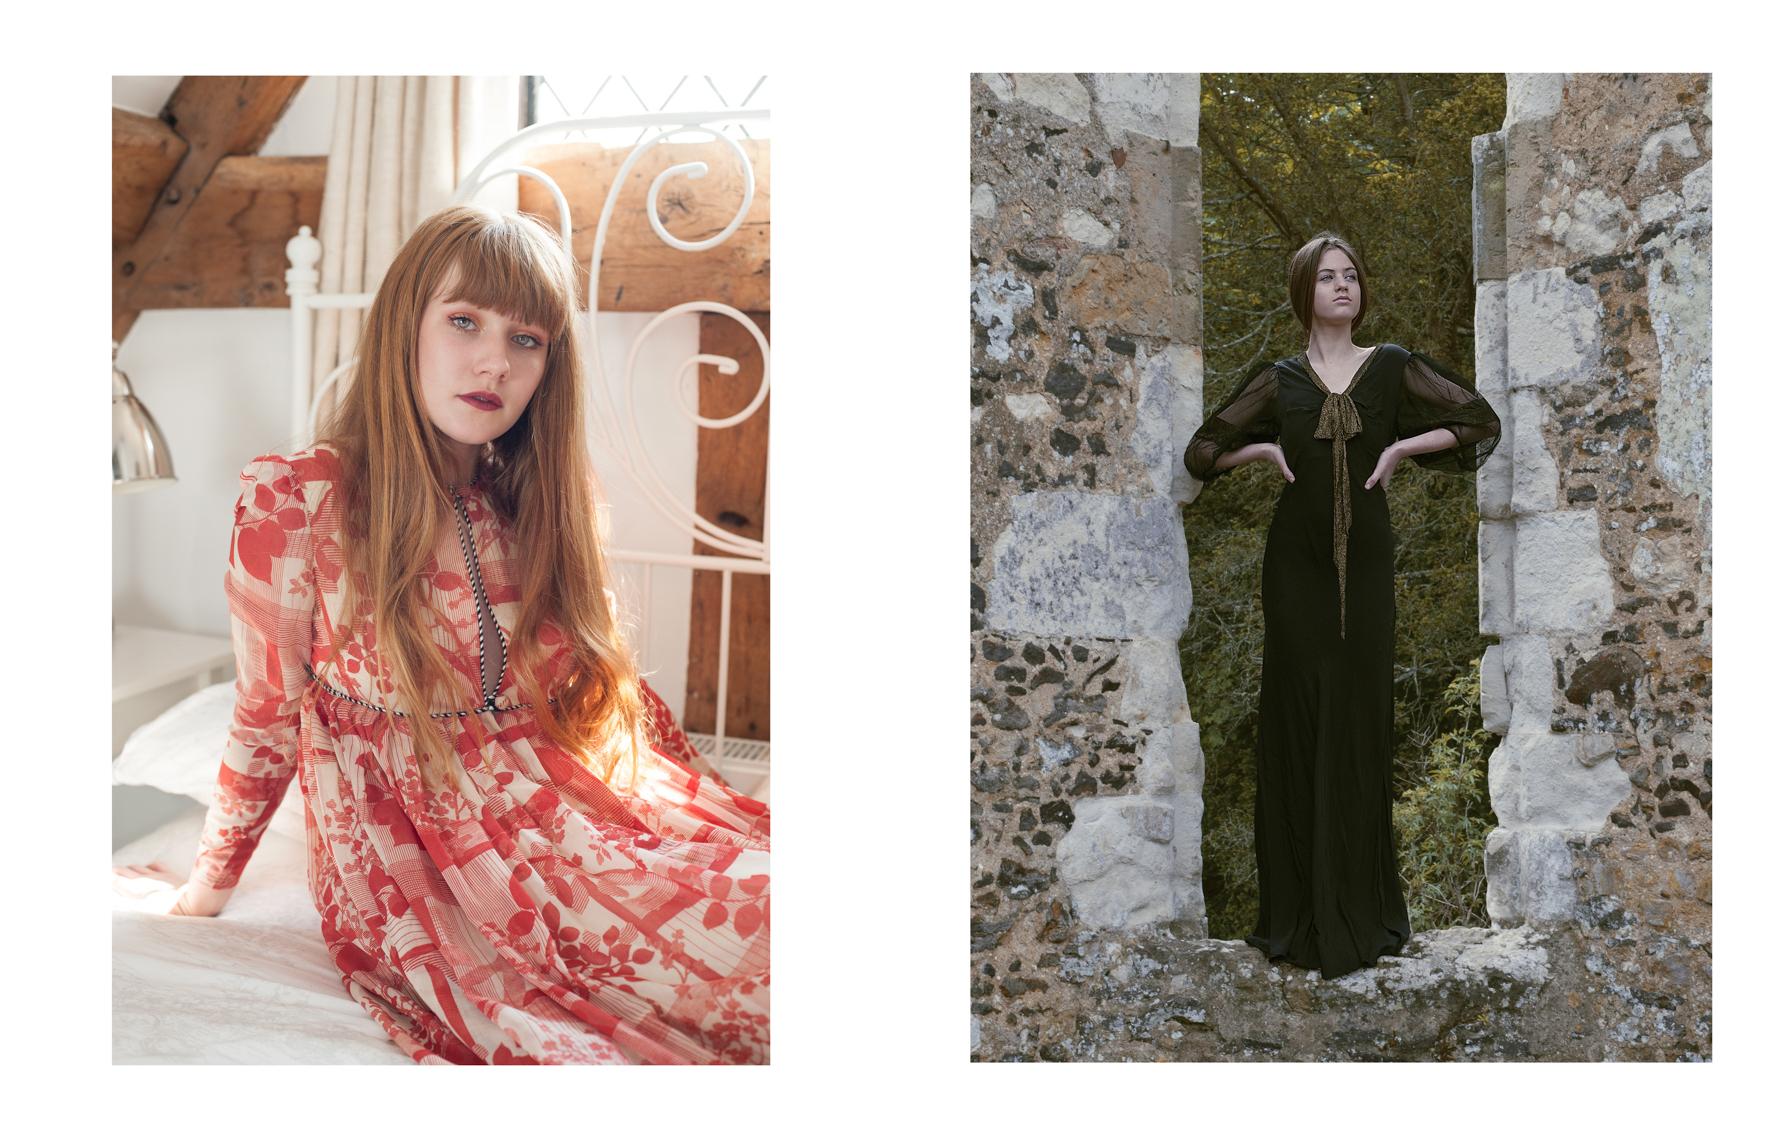 Fashion editorial portrait for 7Roar magazine by Farnham, Surrey based photographer James Muller